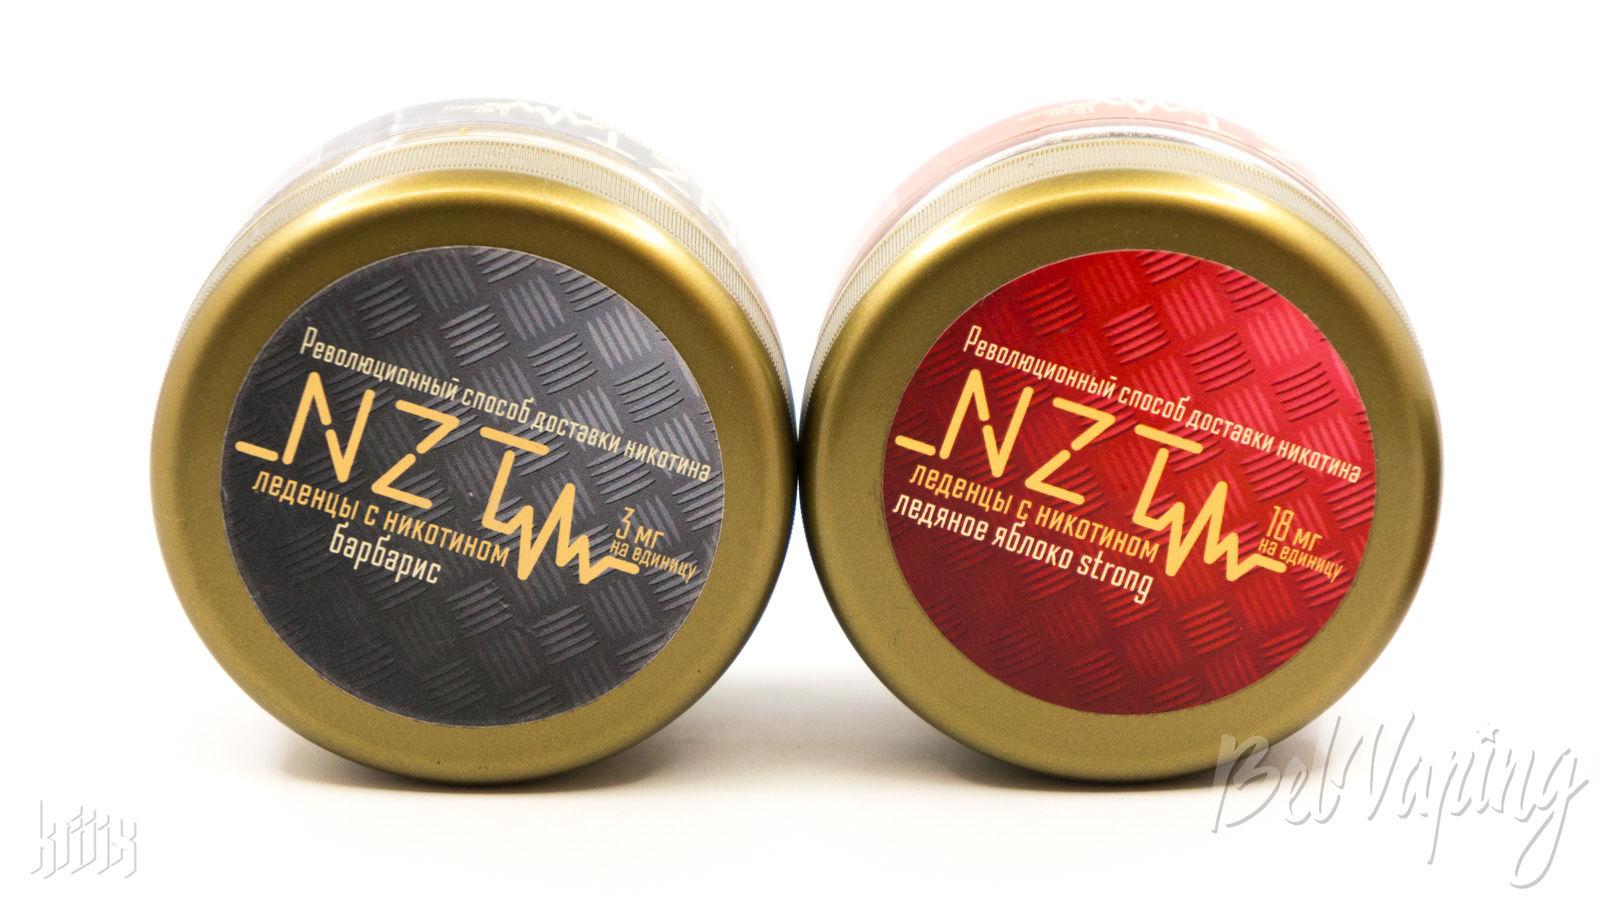 Упаковка леденцов NZT